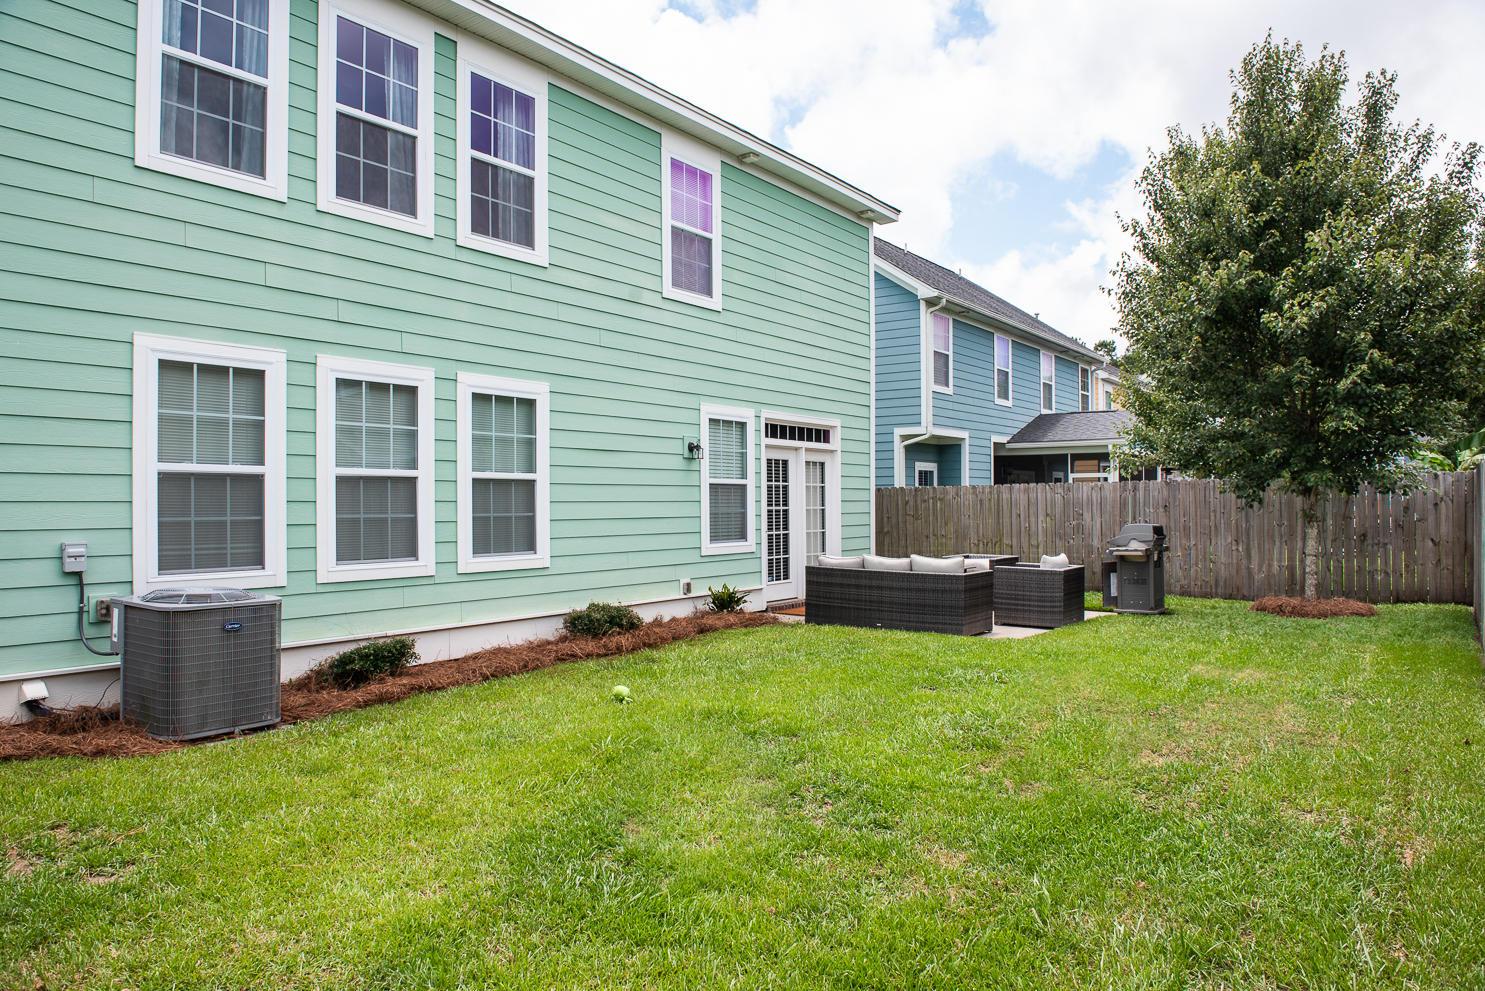 Nelliefield Plantation Homes For Sale - 119 Indigo Marsh, Wando, SC - 0